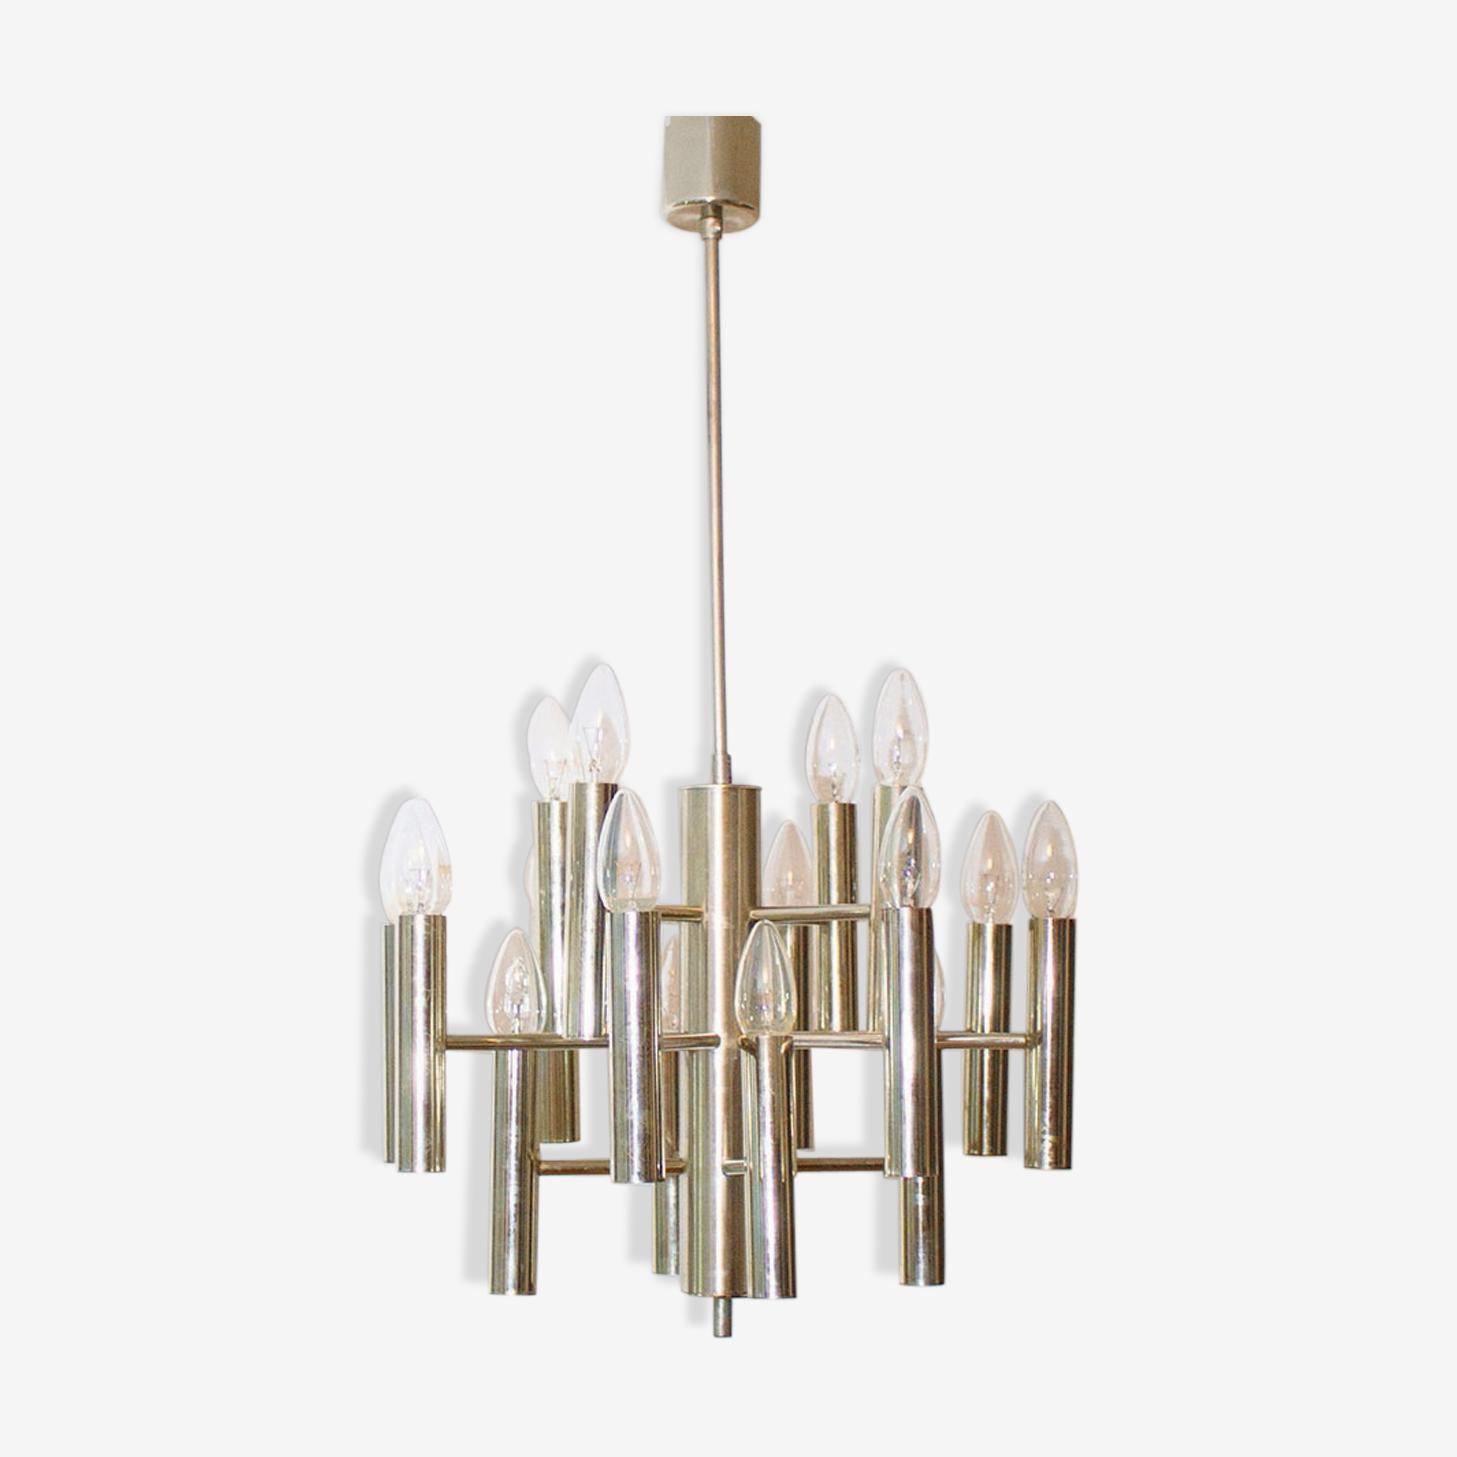 Sixteen-light countdown chrome candlestick (Sputnik), 1960, Italy